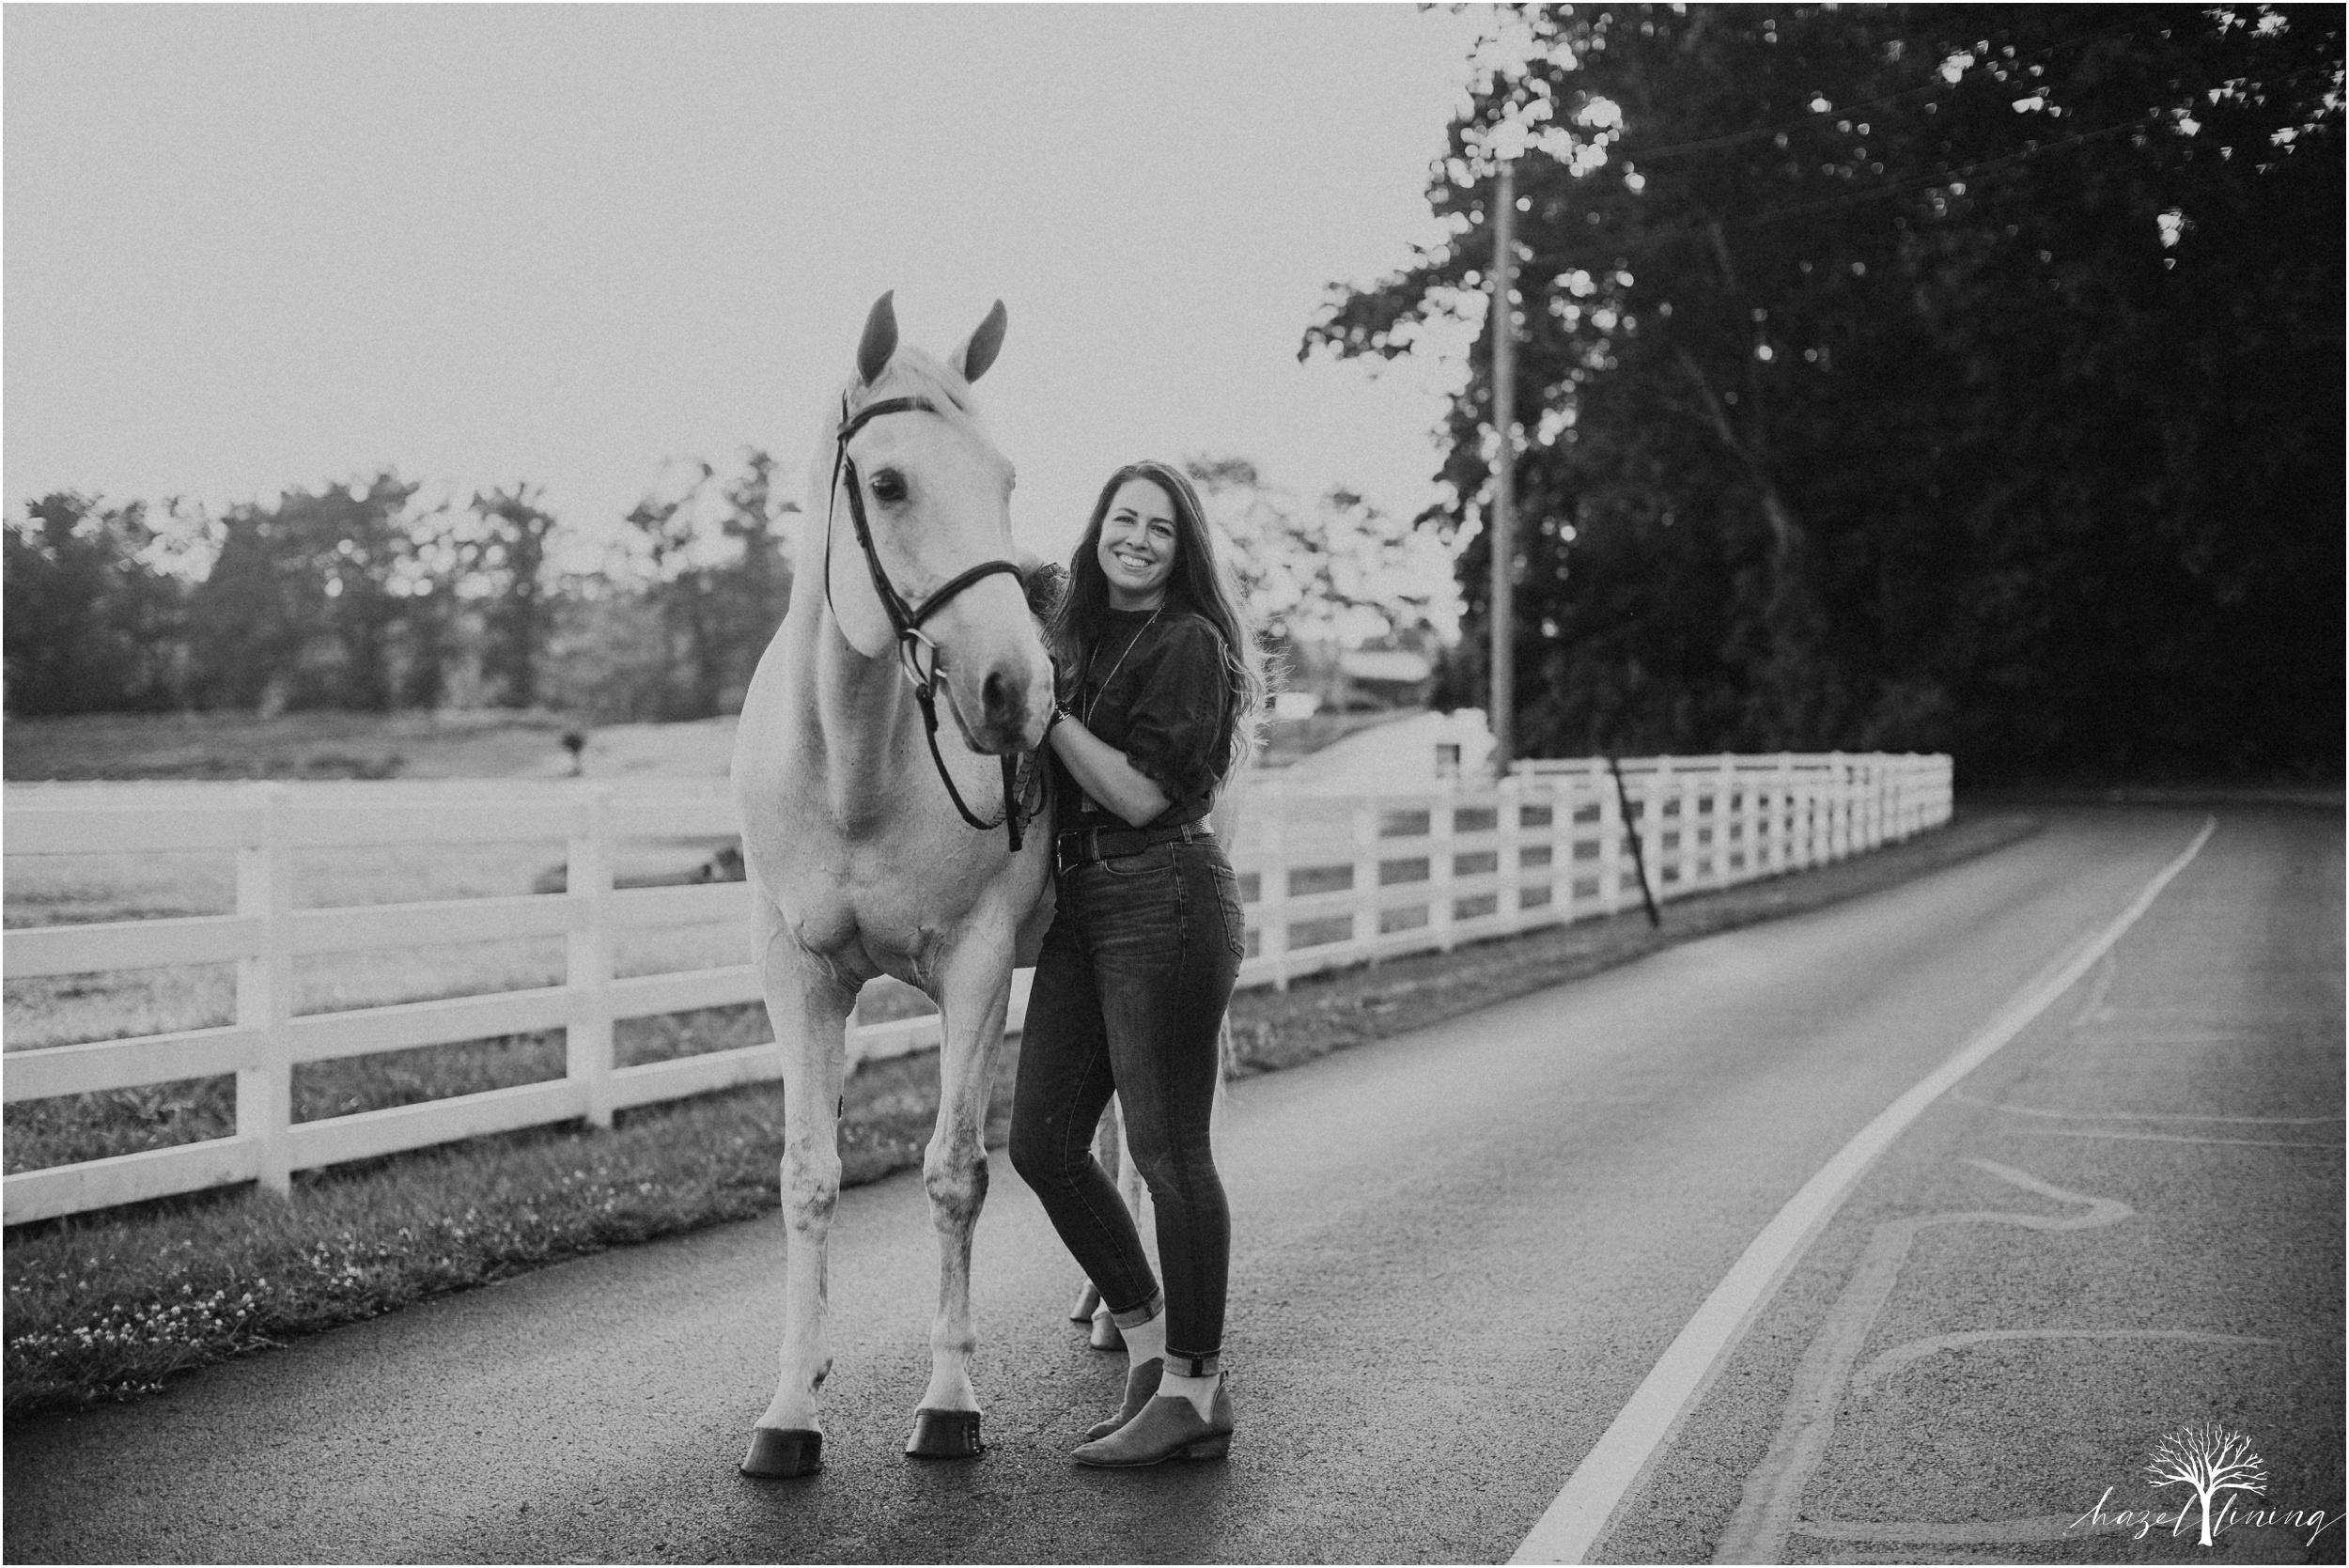 taylor-adams-and-horse-delaware-valley-university-delval-summer-equestrian-portrait-session-hazel-lining-photography-destination-elopement-wedding-engagement-photography_0017.jpg